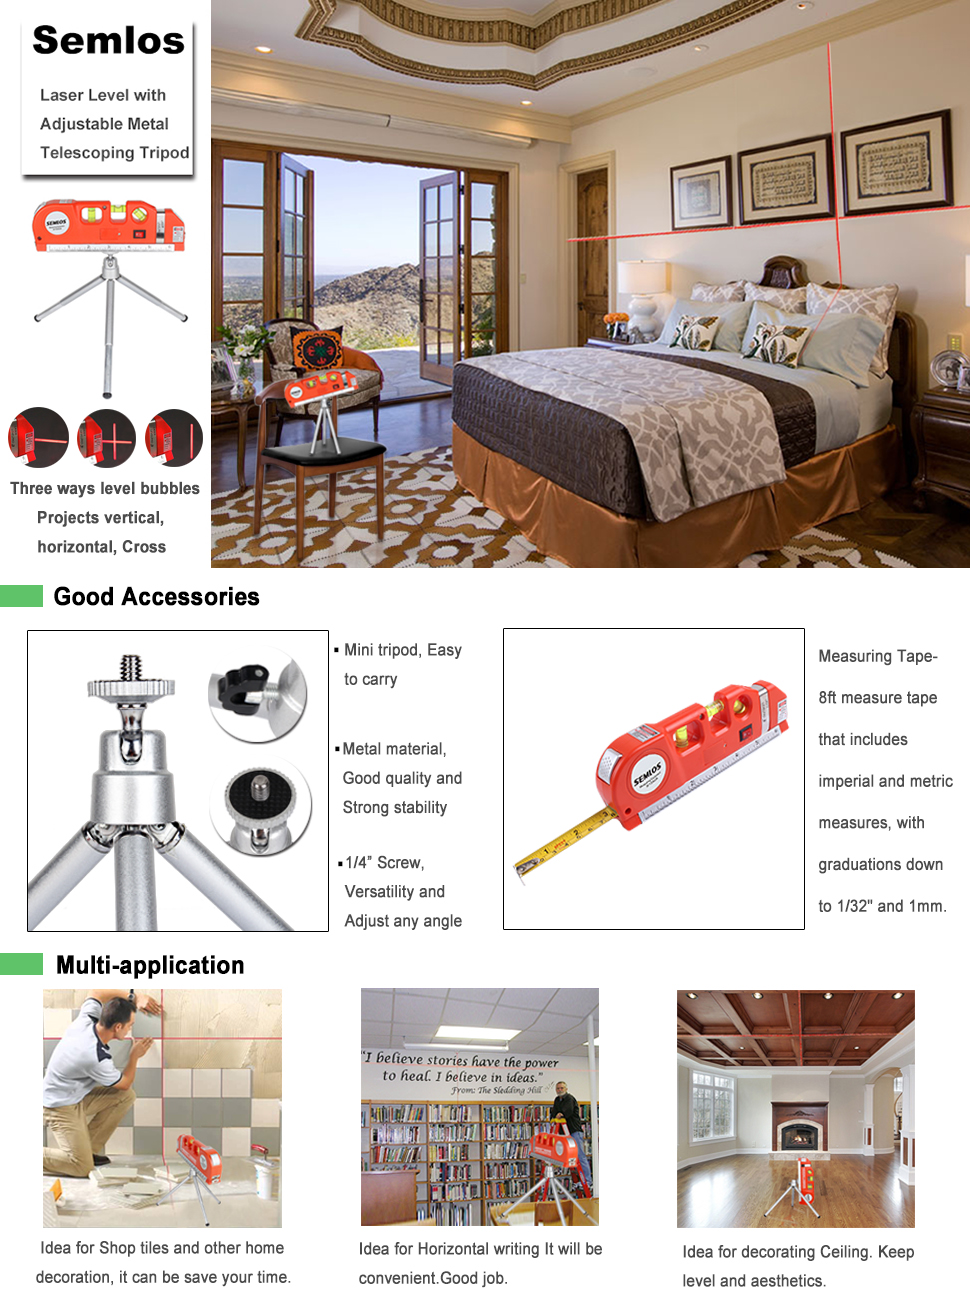 Home Renovation Ads Samples Magnificent Home Design